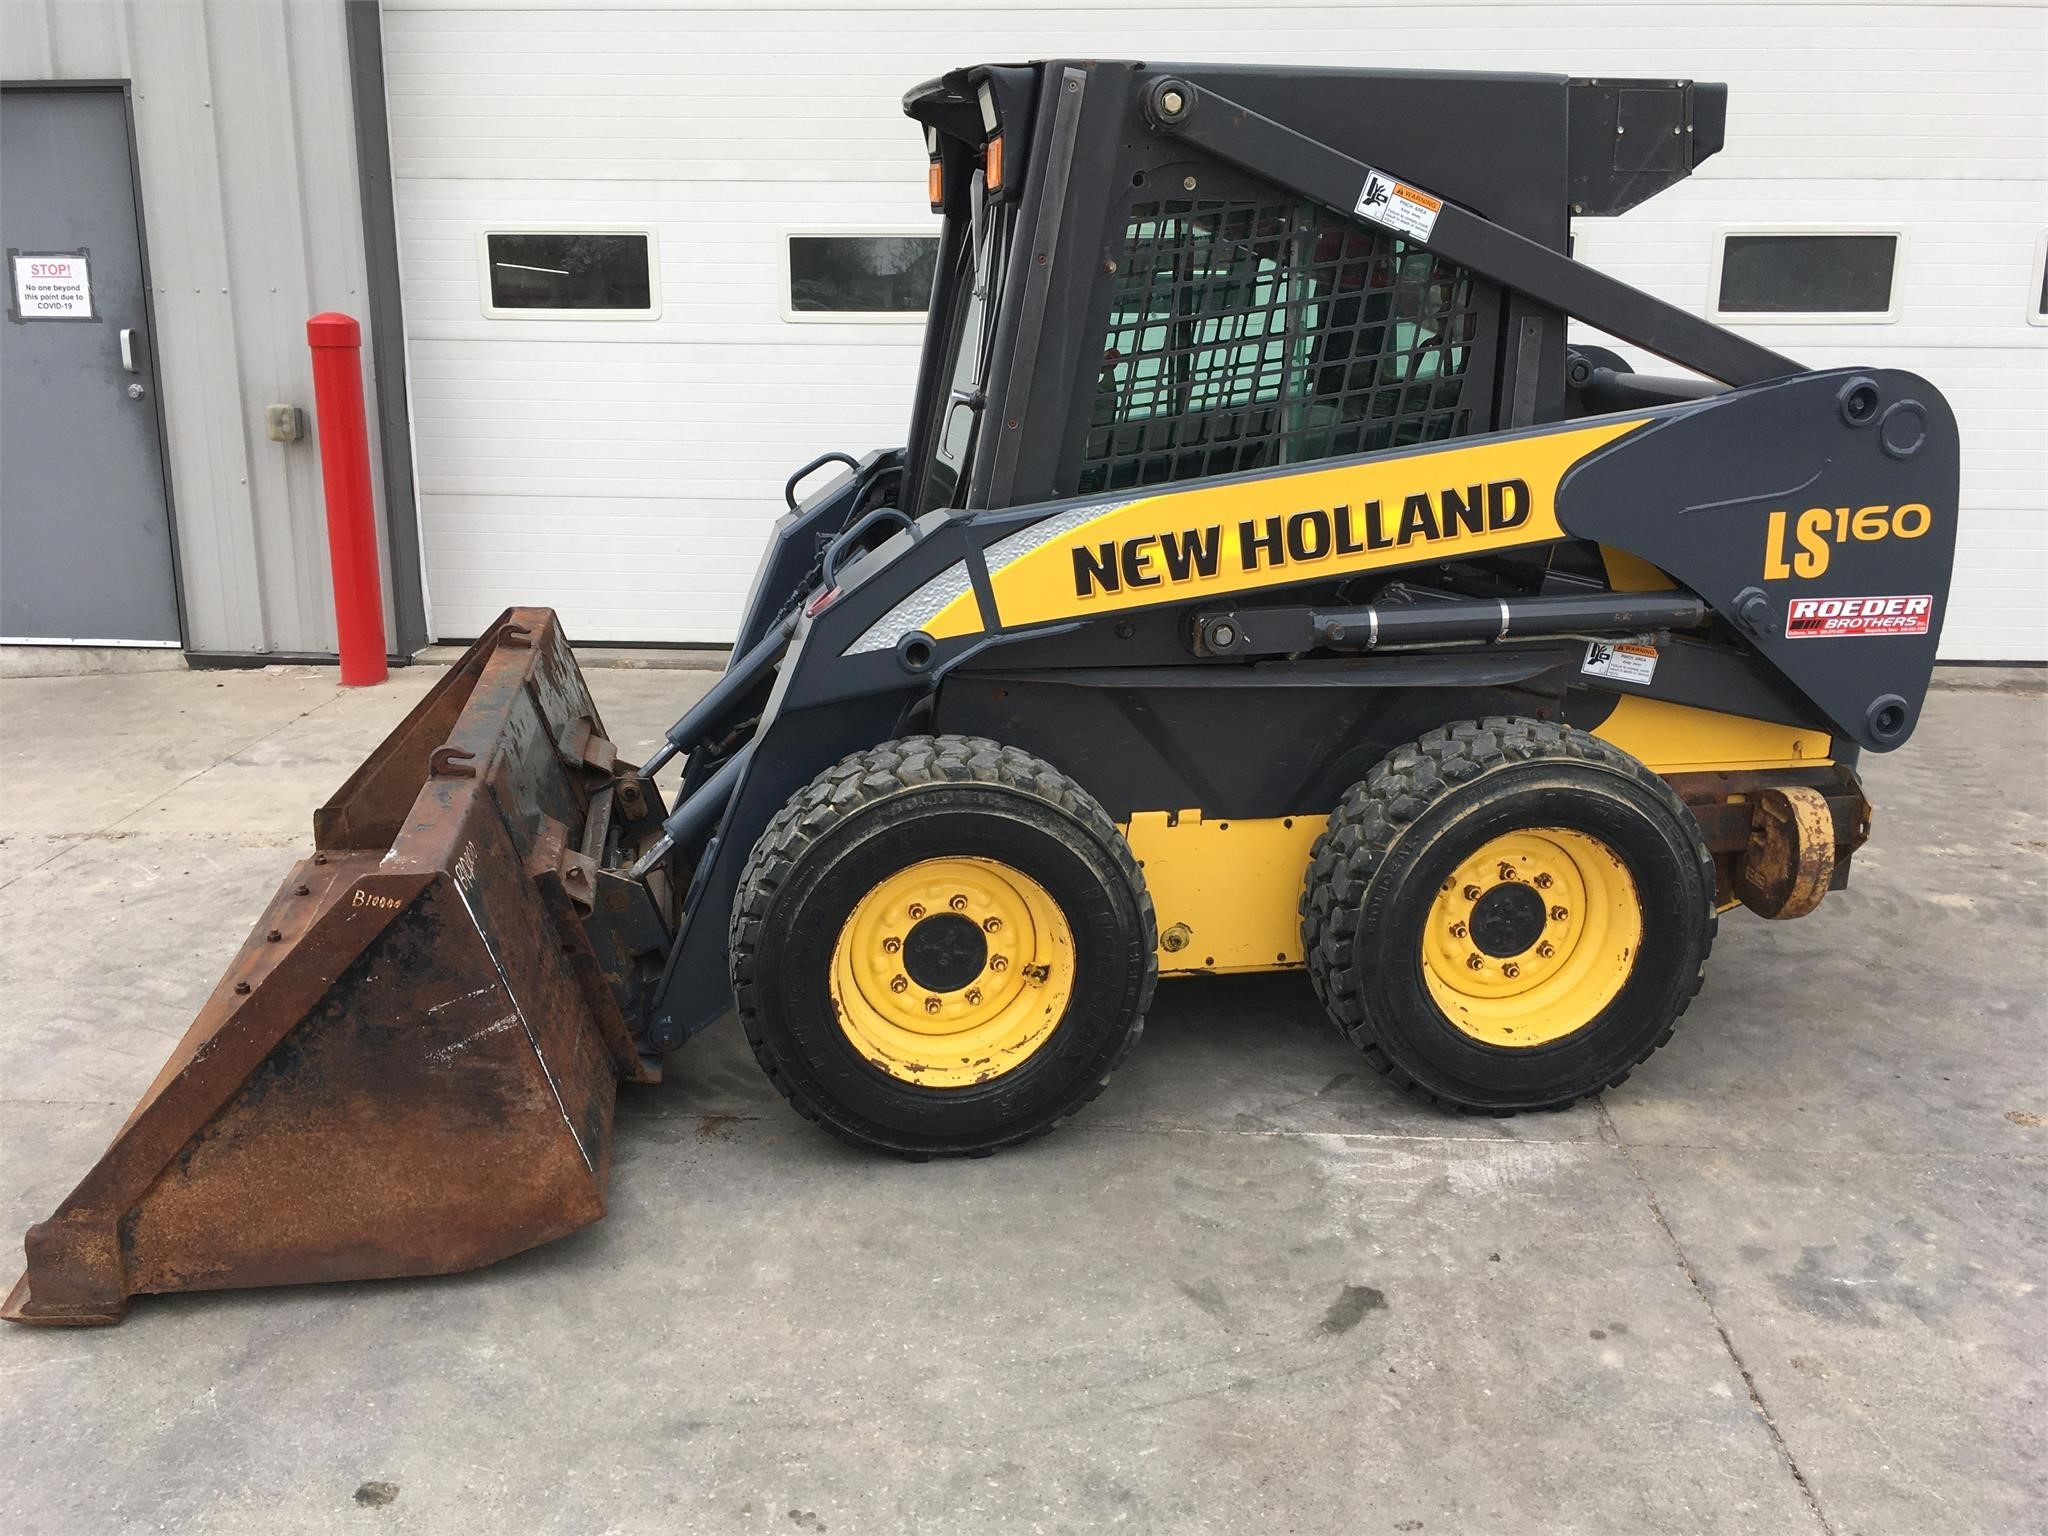 2004 New Holland LS160 Skid Steer